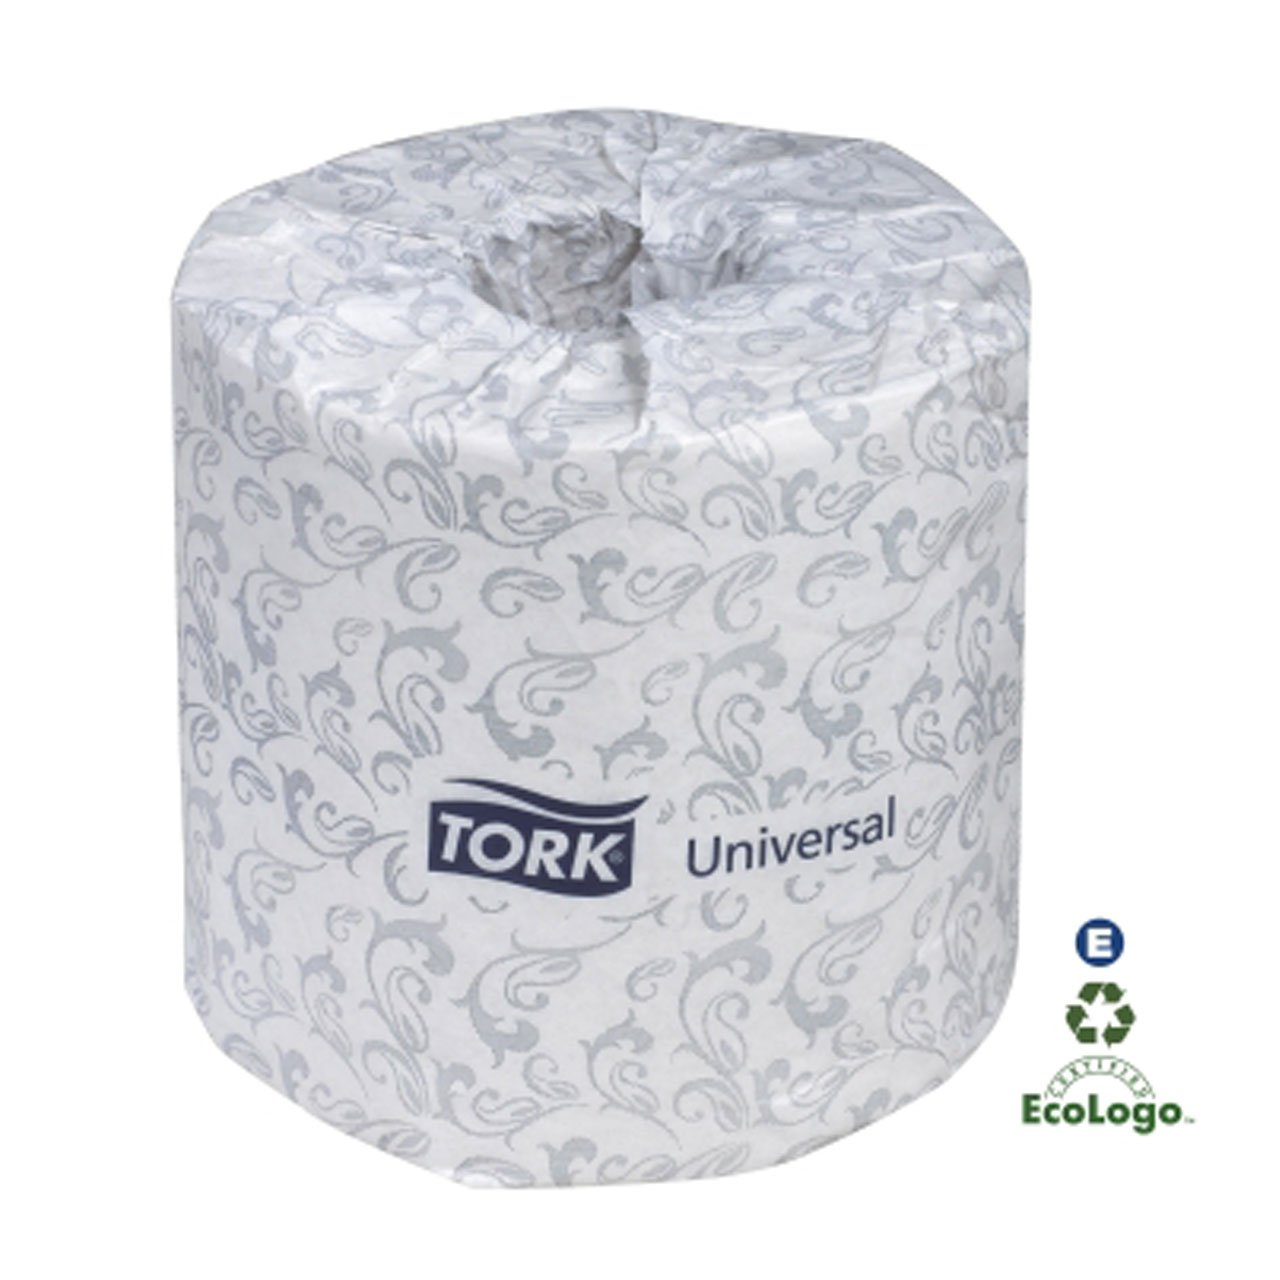 Tork TS1636S Universal Single-Ply Toilet Tissue Roll, White, 96 ...